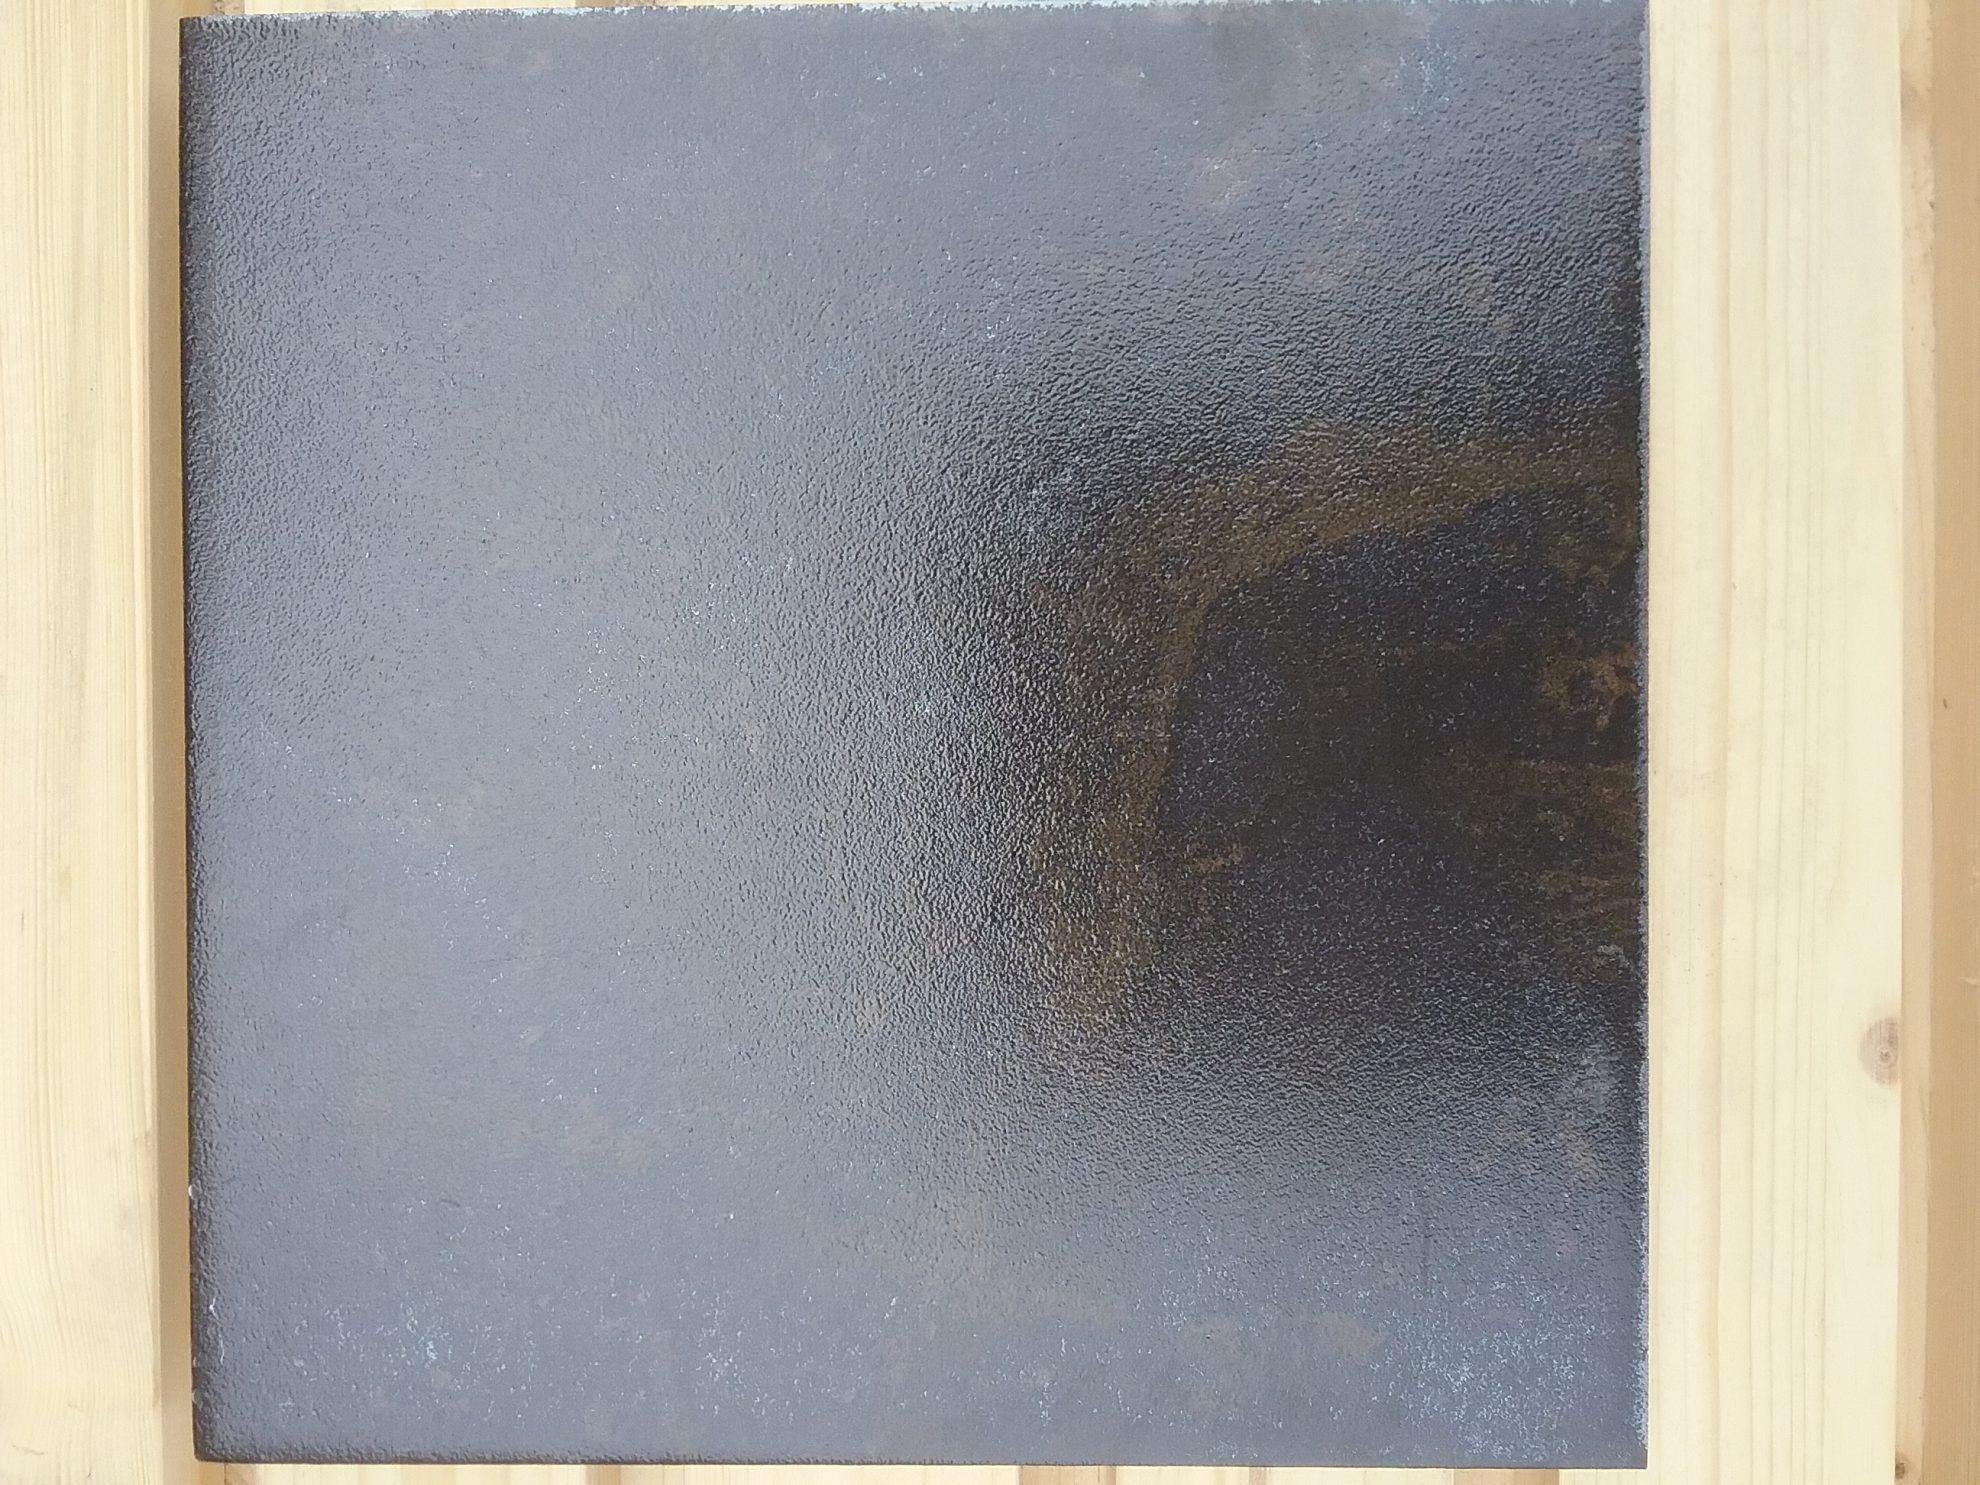 Pltyelės Antares 16N 16,5×16,5